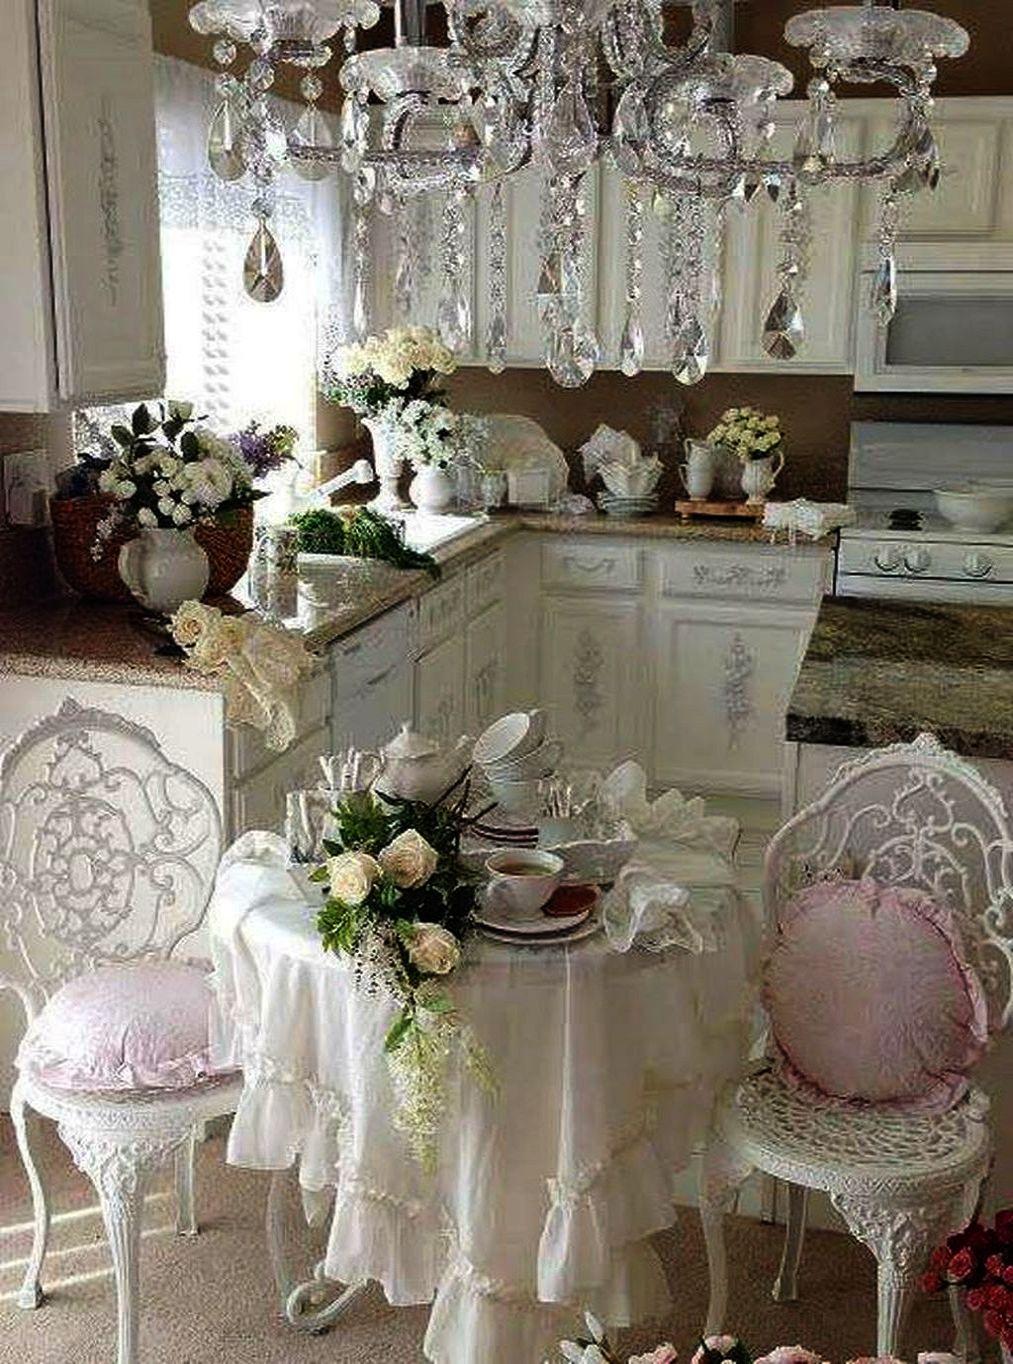 Astounding beautiful home interior design styles collect also rh pinterest